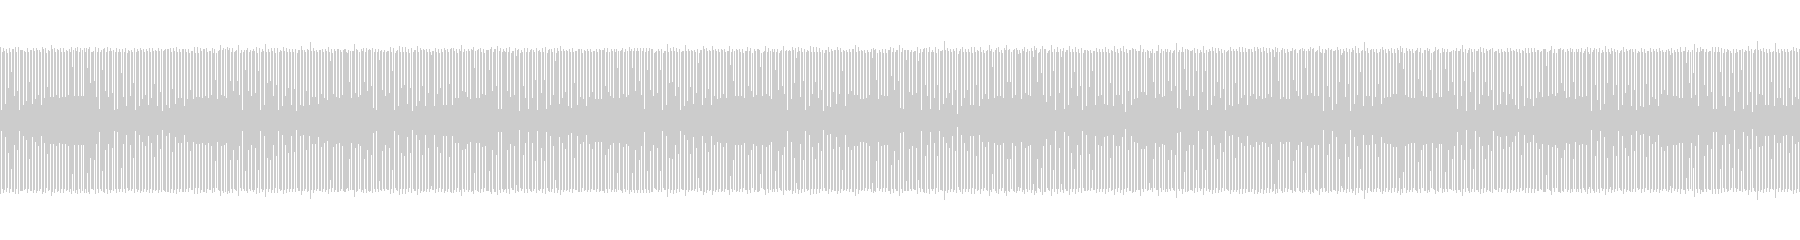 1970S ARP ODYSSEY...の未再生の波形